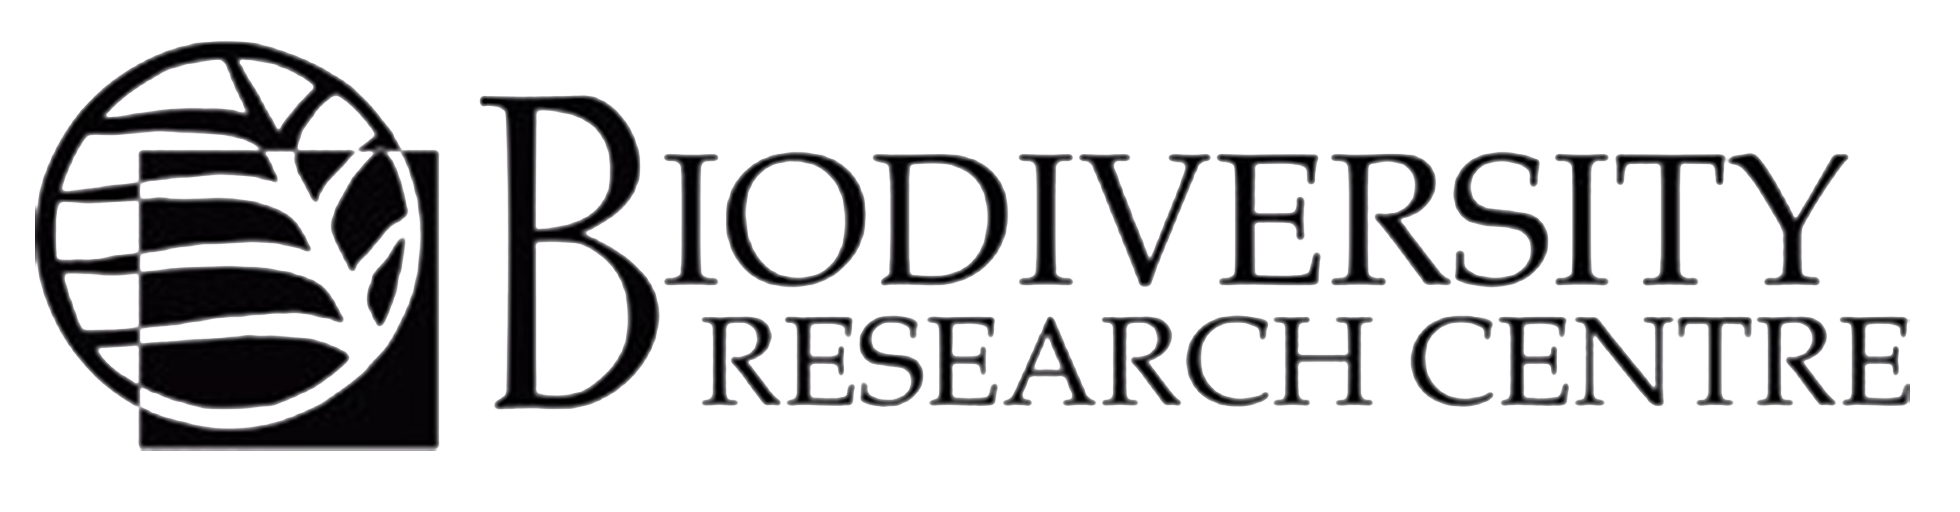 Biodiversity Research Centre BC logo transparent